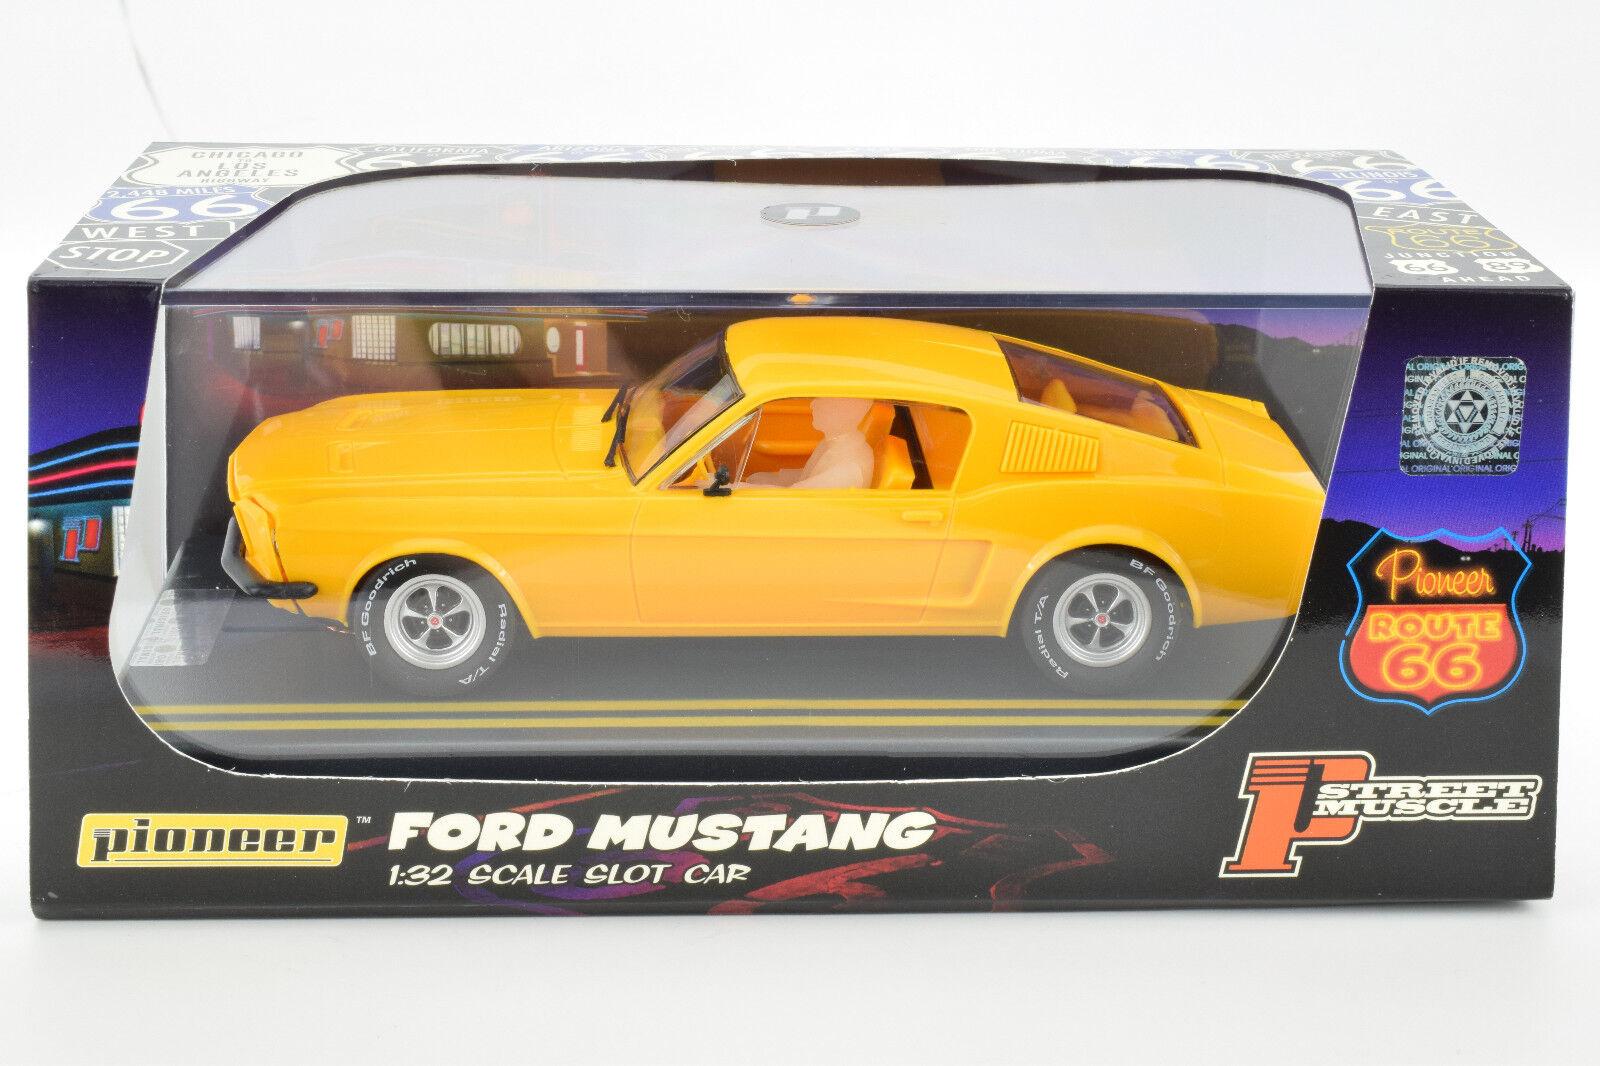 Pioneer 1968 Ford Mustang Notchback Naranja Claro J-Code Projootipo 1 32